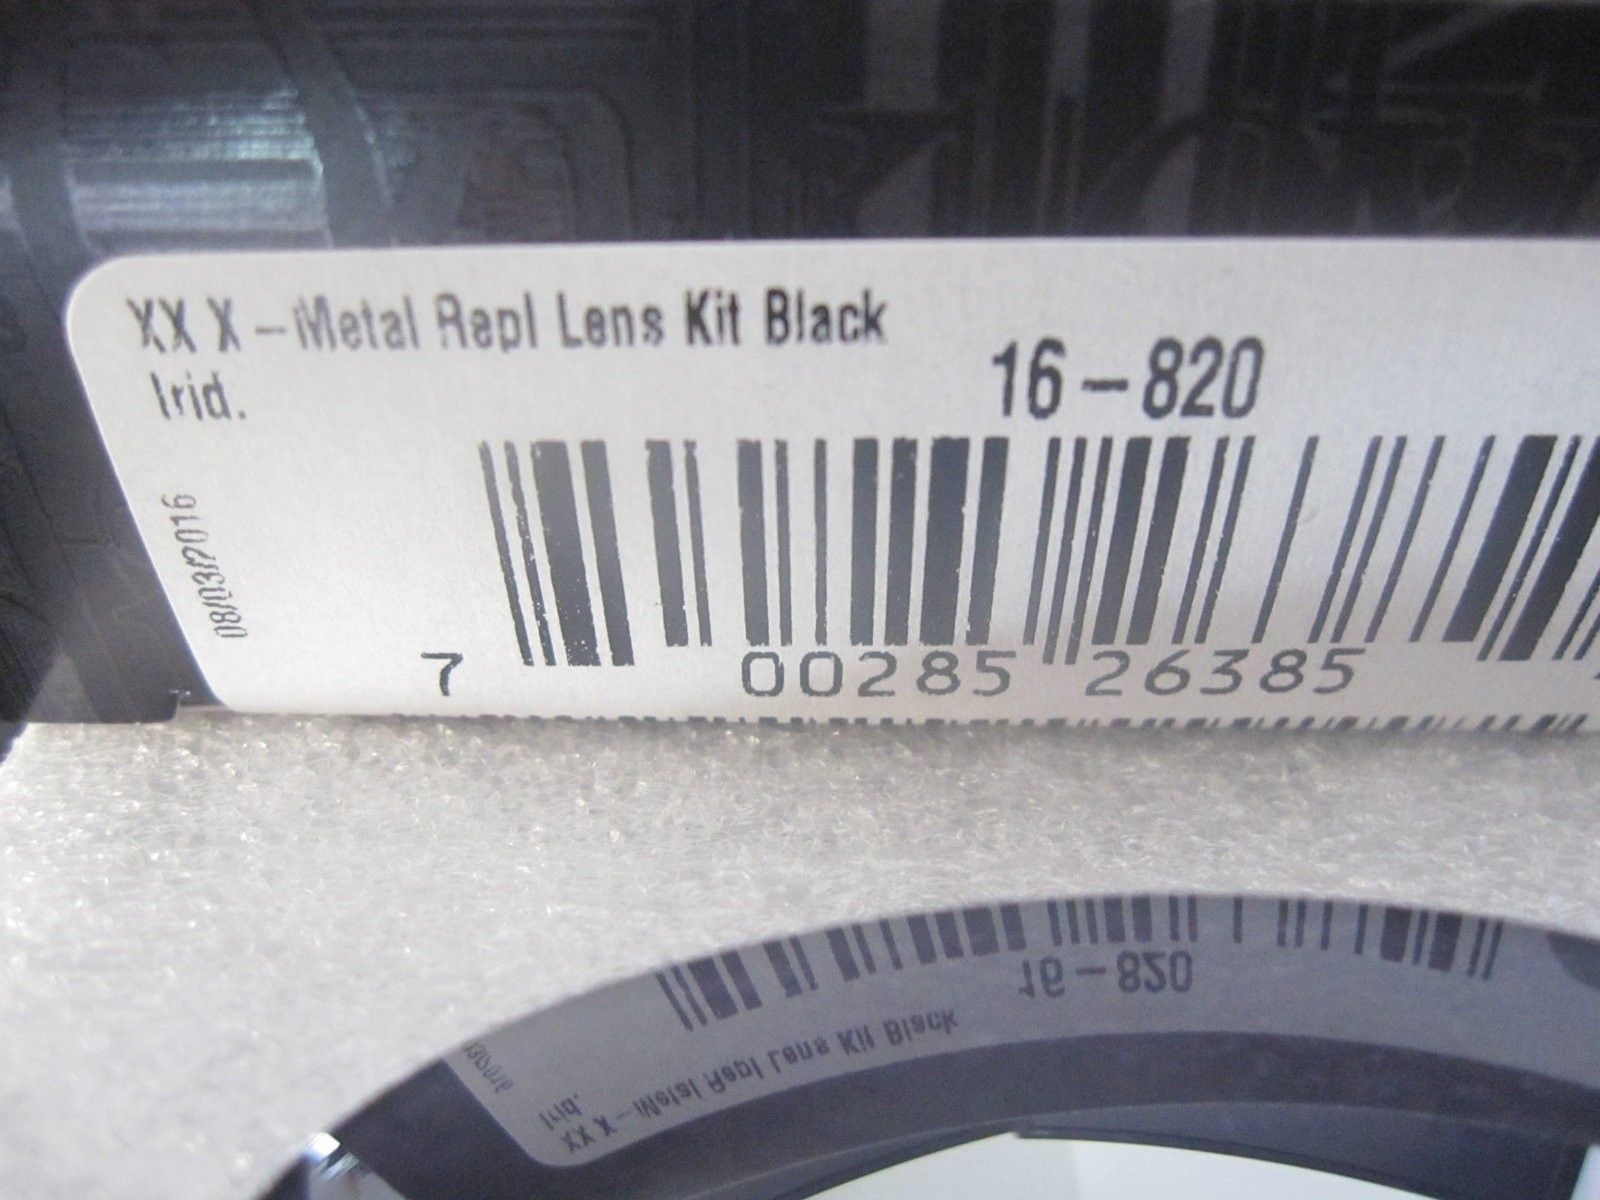 BNIB XX OEM BI Lenses - SKU 16-820 - GONE - IMG_5440.JPG